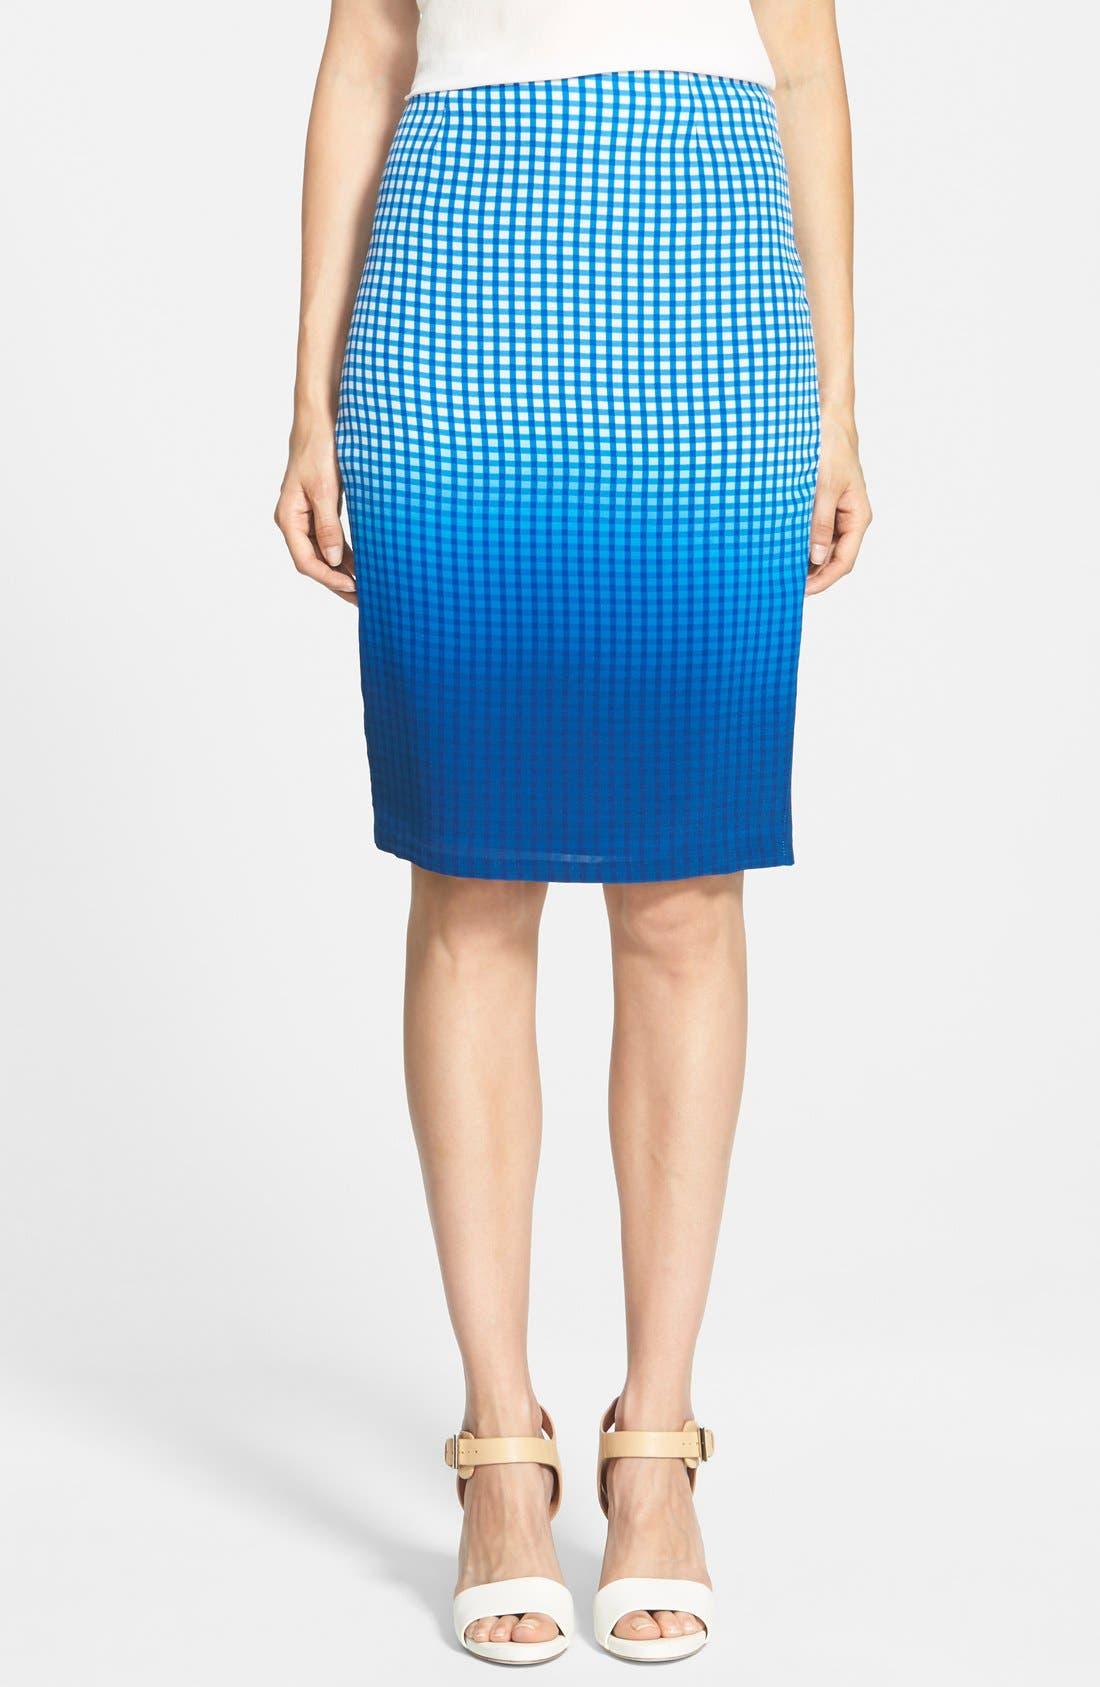 Alternate Image 1 Selected - Bailey 44 'Astley' Dip Dye Check Silk Pencil Skirt